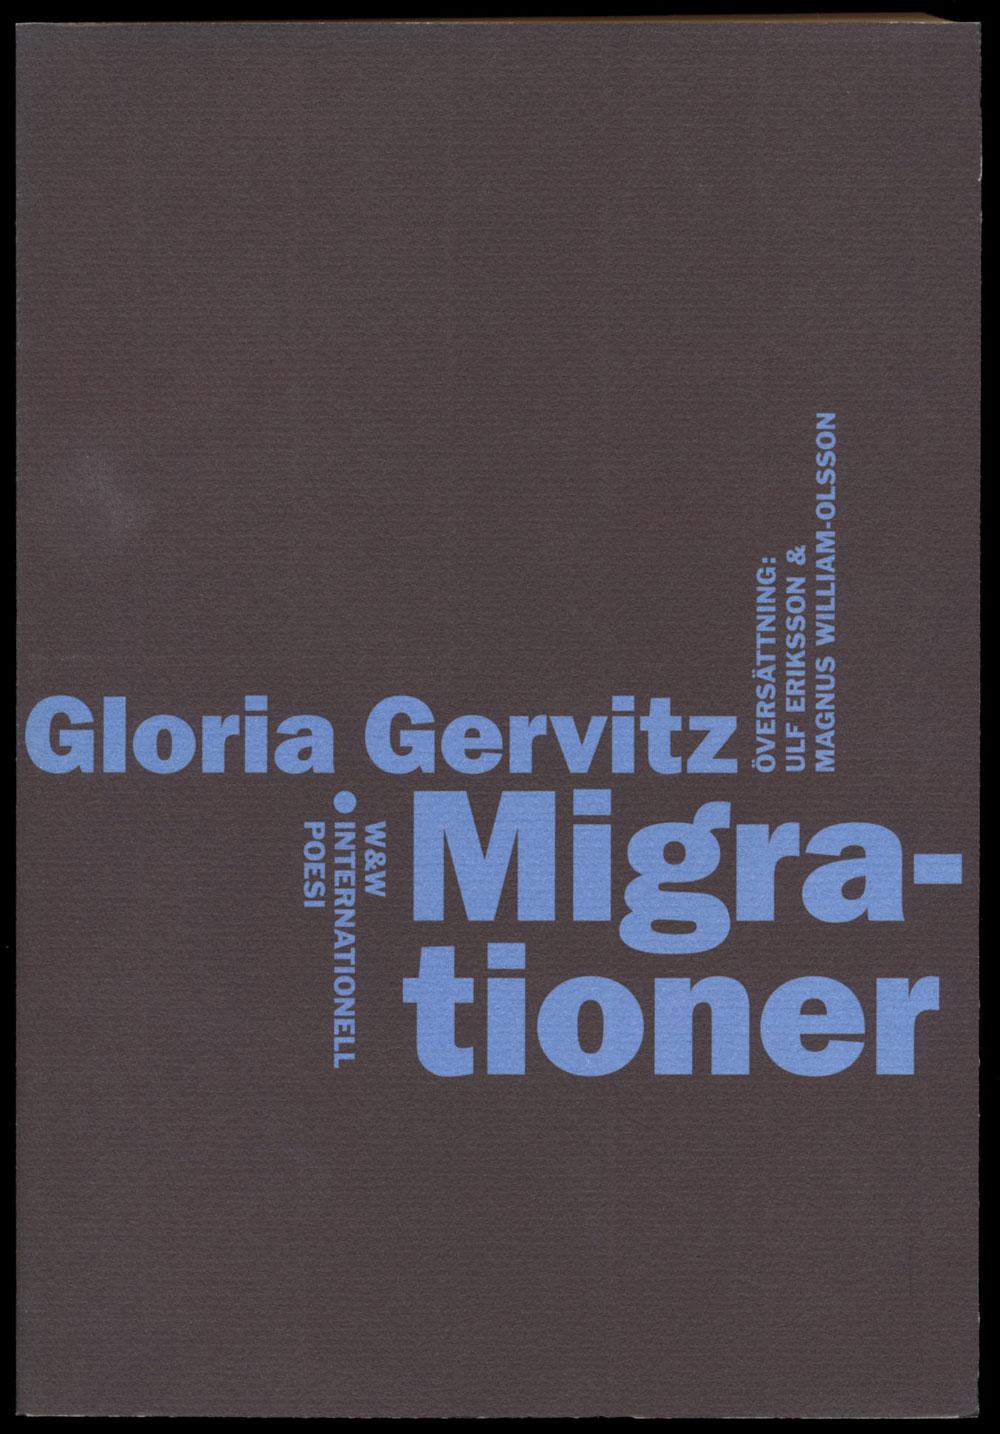 Gloria Gervitz Migrationer Wahlström & Widstrands serie med internationell poesi